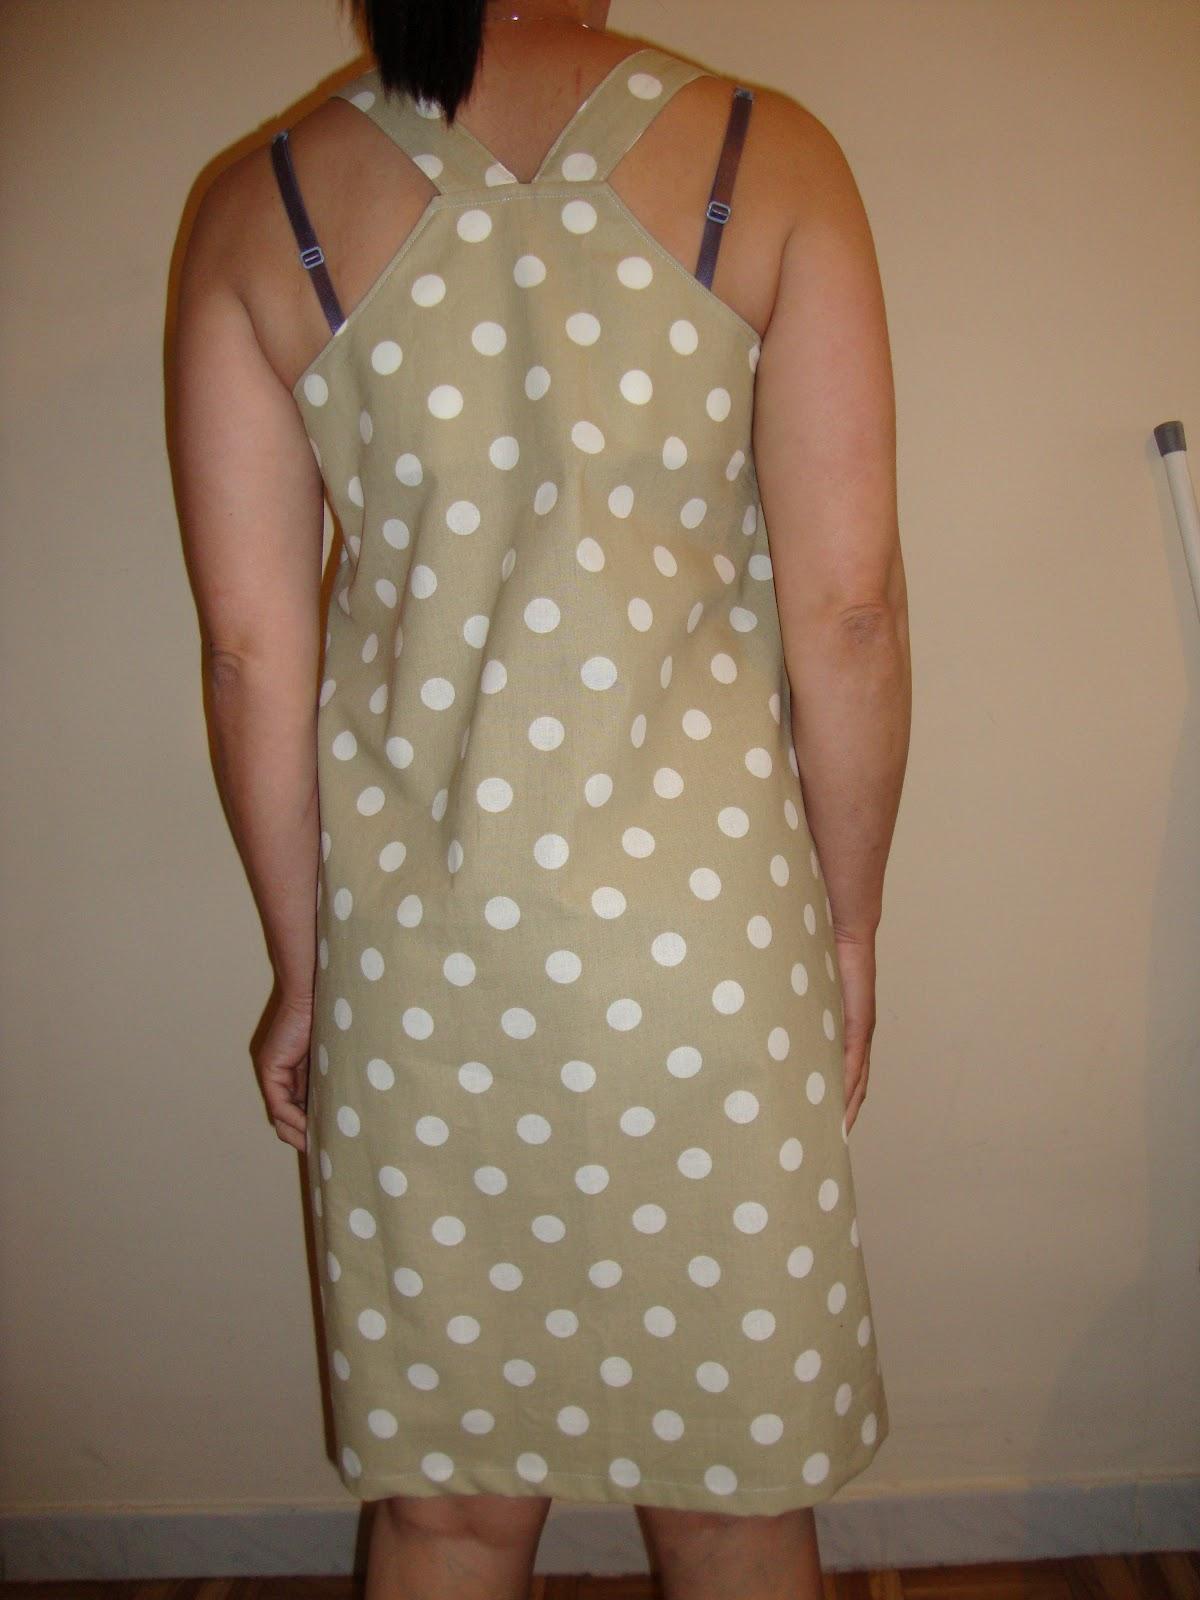 Cerises Grises: Robe-tablier